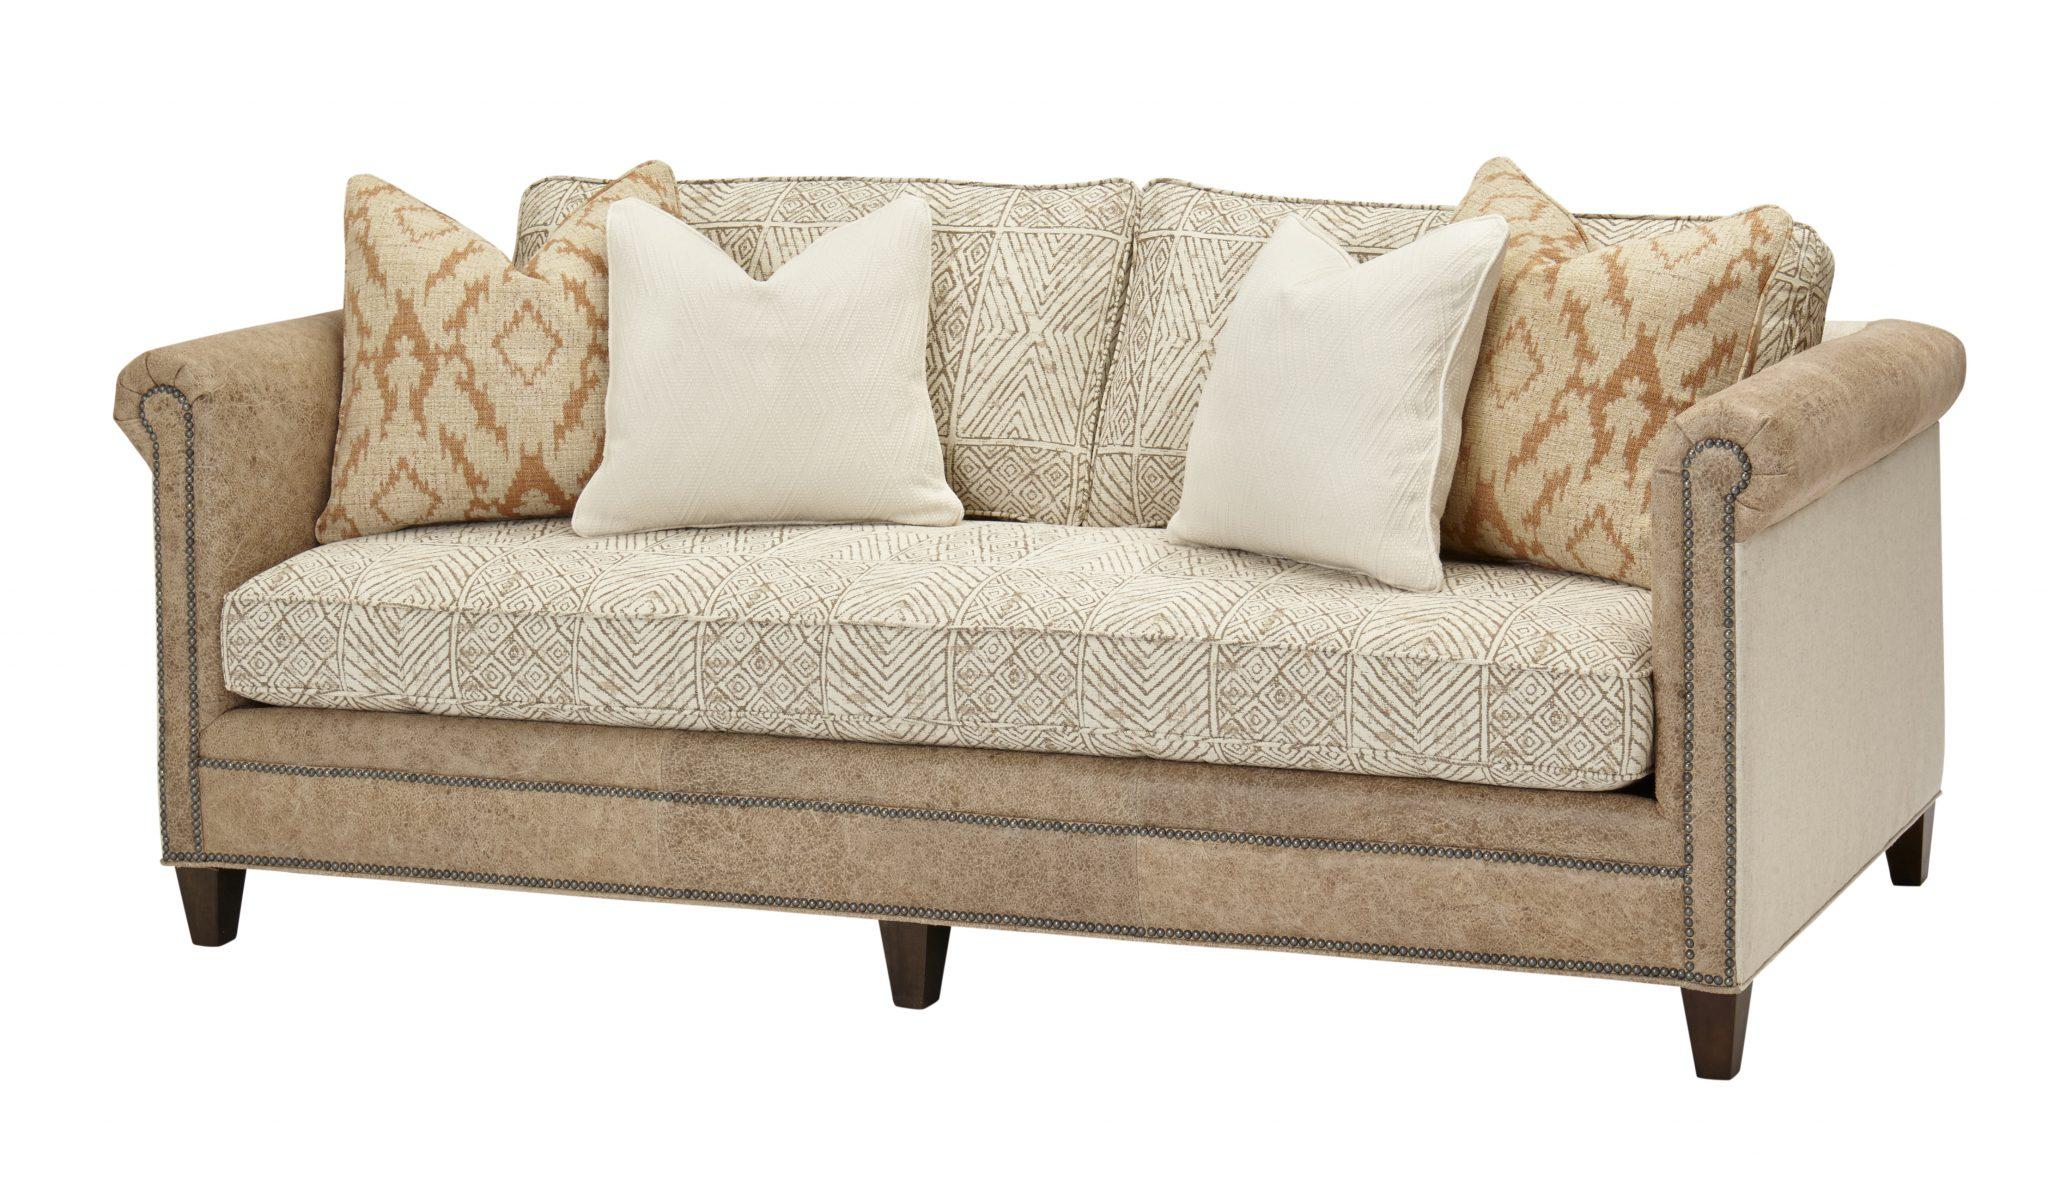 massoud pin furniture danish sofa modern cupboard pinterest and century mid